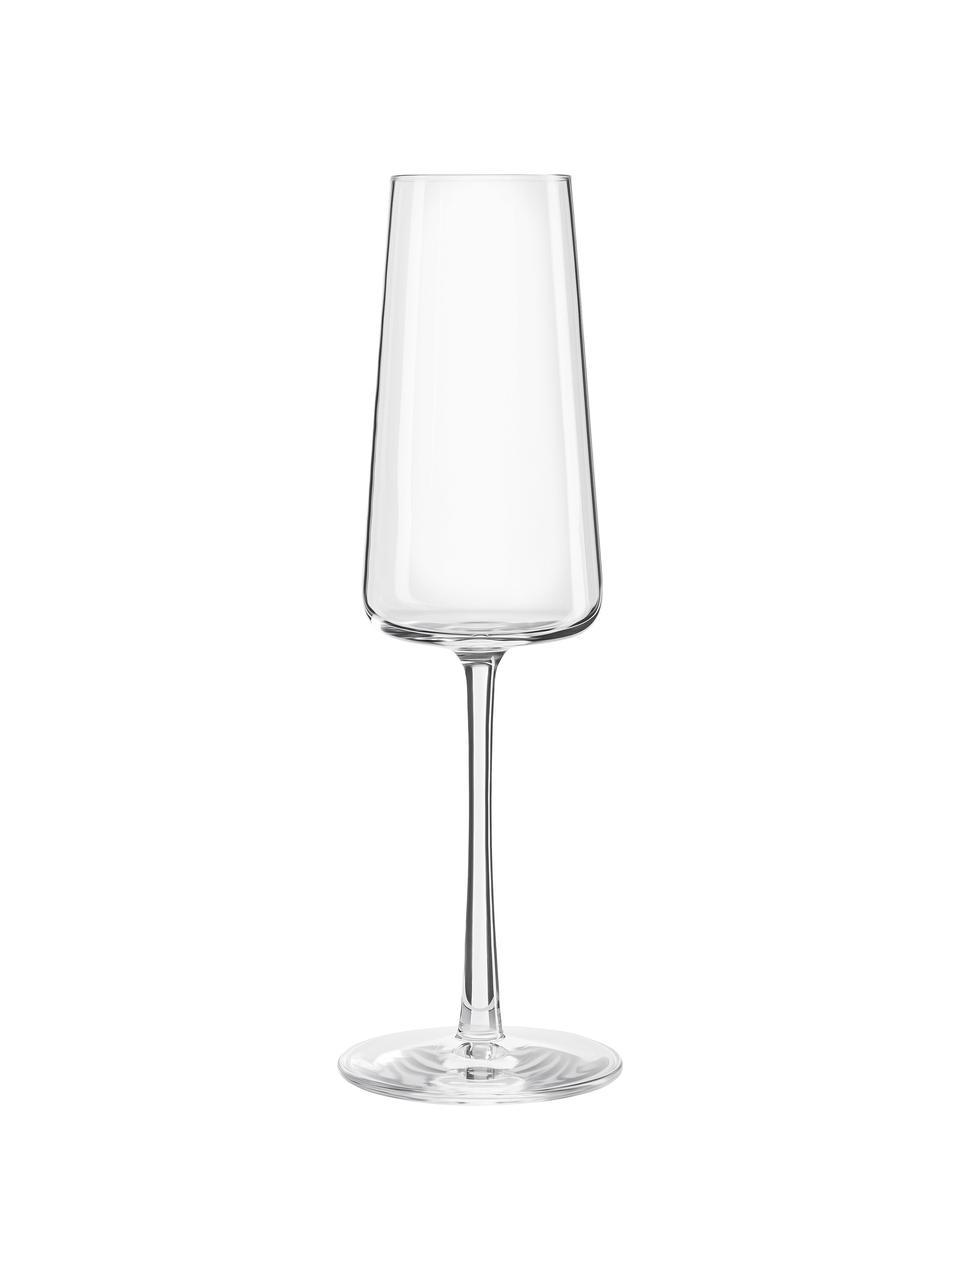 Kristallen champagneglazen Power, 6 stuks, Kristalglas, Transparant, Ø 7 x H 23 cm